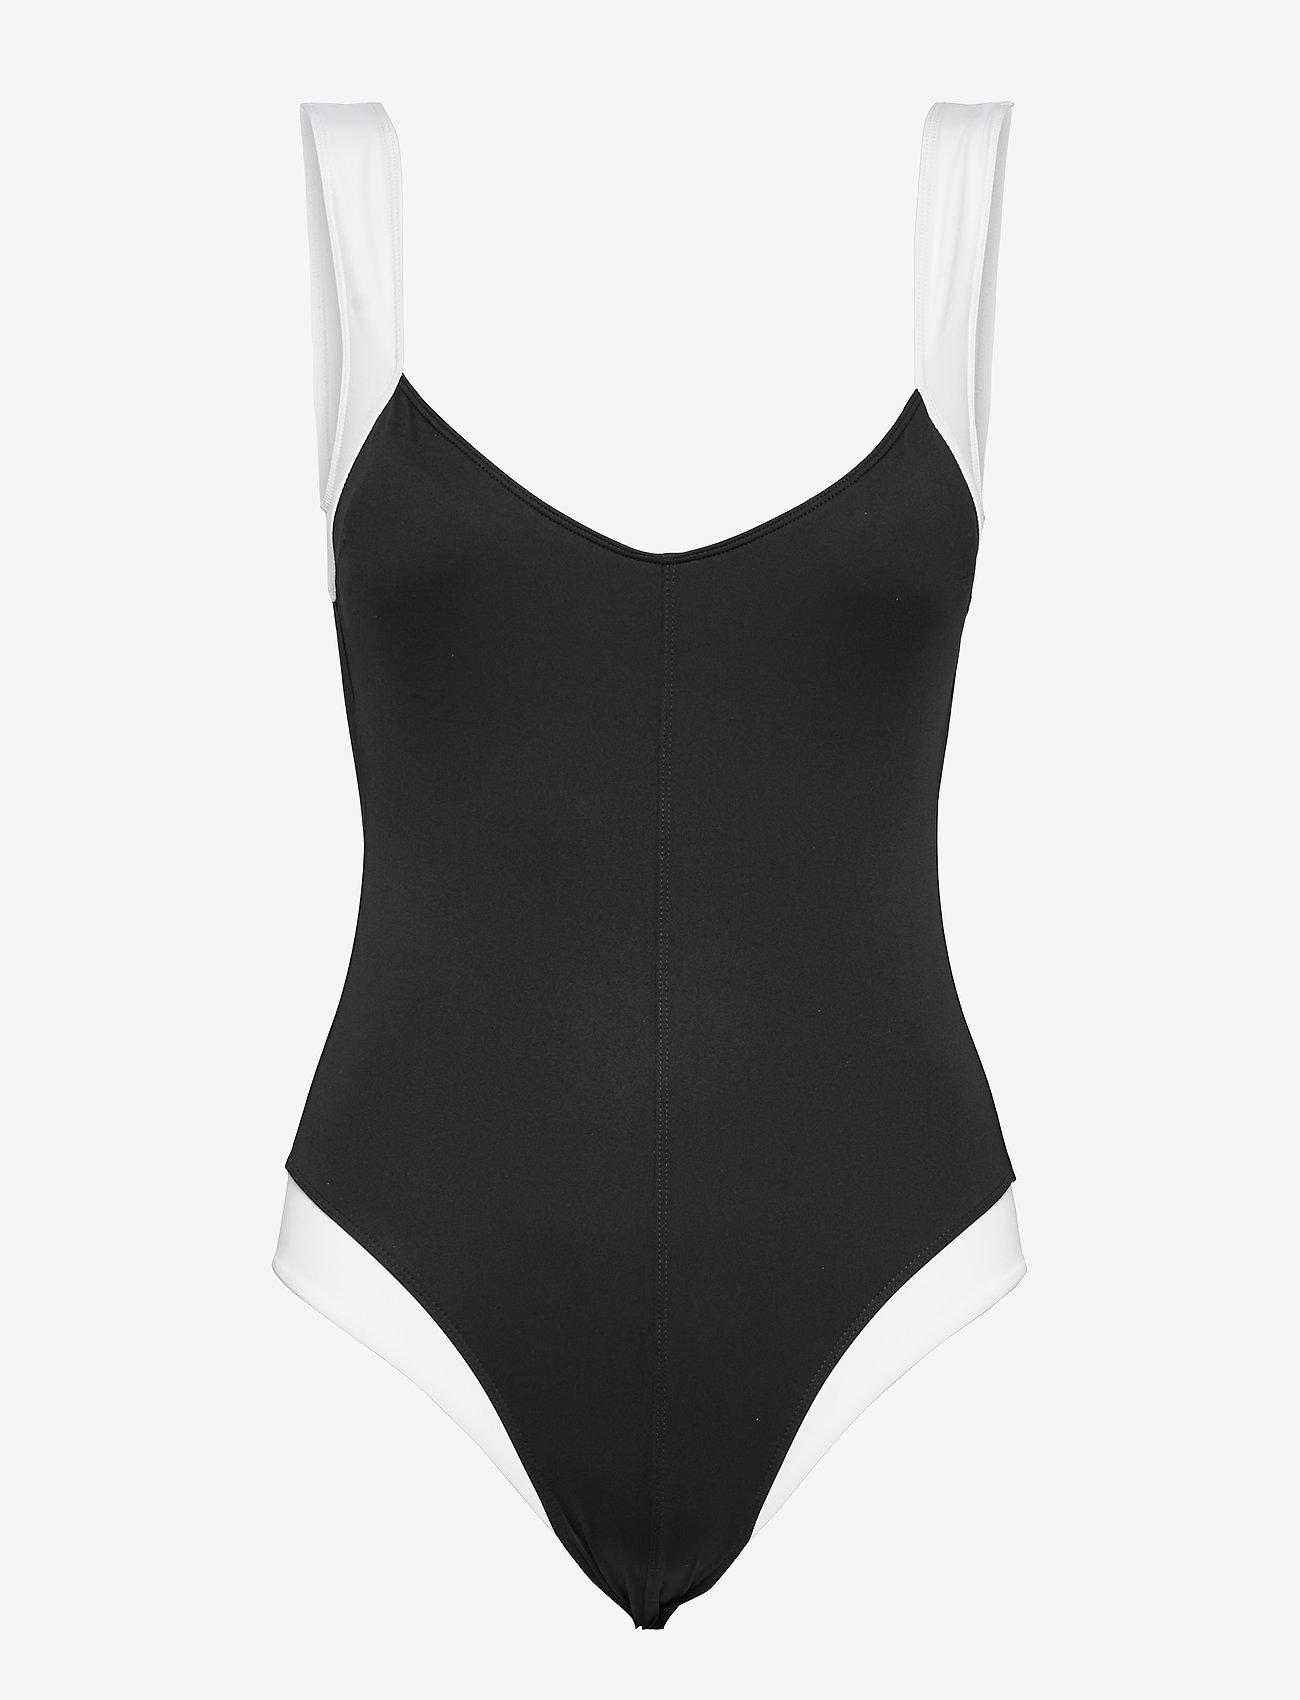 Max Mara Leisure - GERBA - swimsuits - black - 0